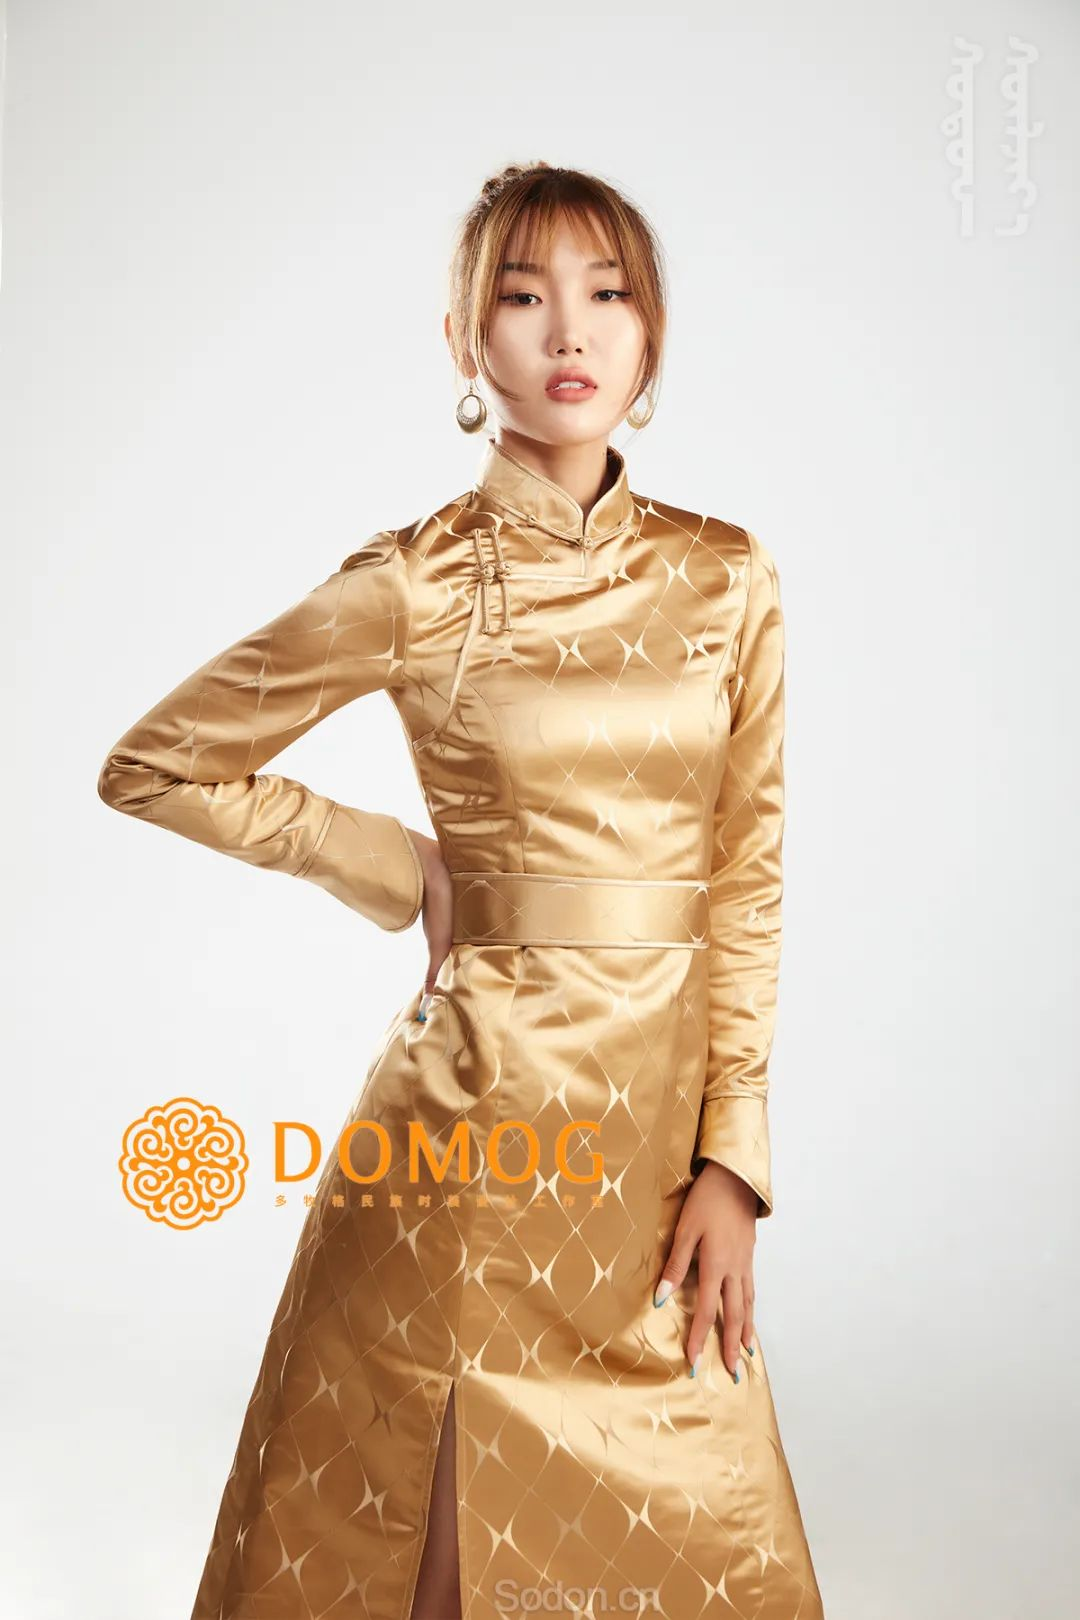 DOMOG 蒙古时装2020新款,民族与时尚的融合 第12张 DOMOG 蒙古时装2020新款,民族与时尚的融合 蒙古服饰